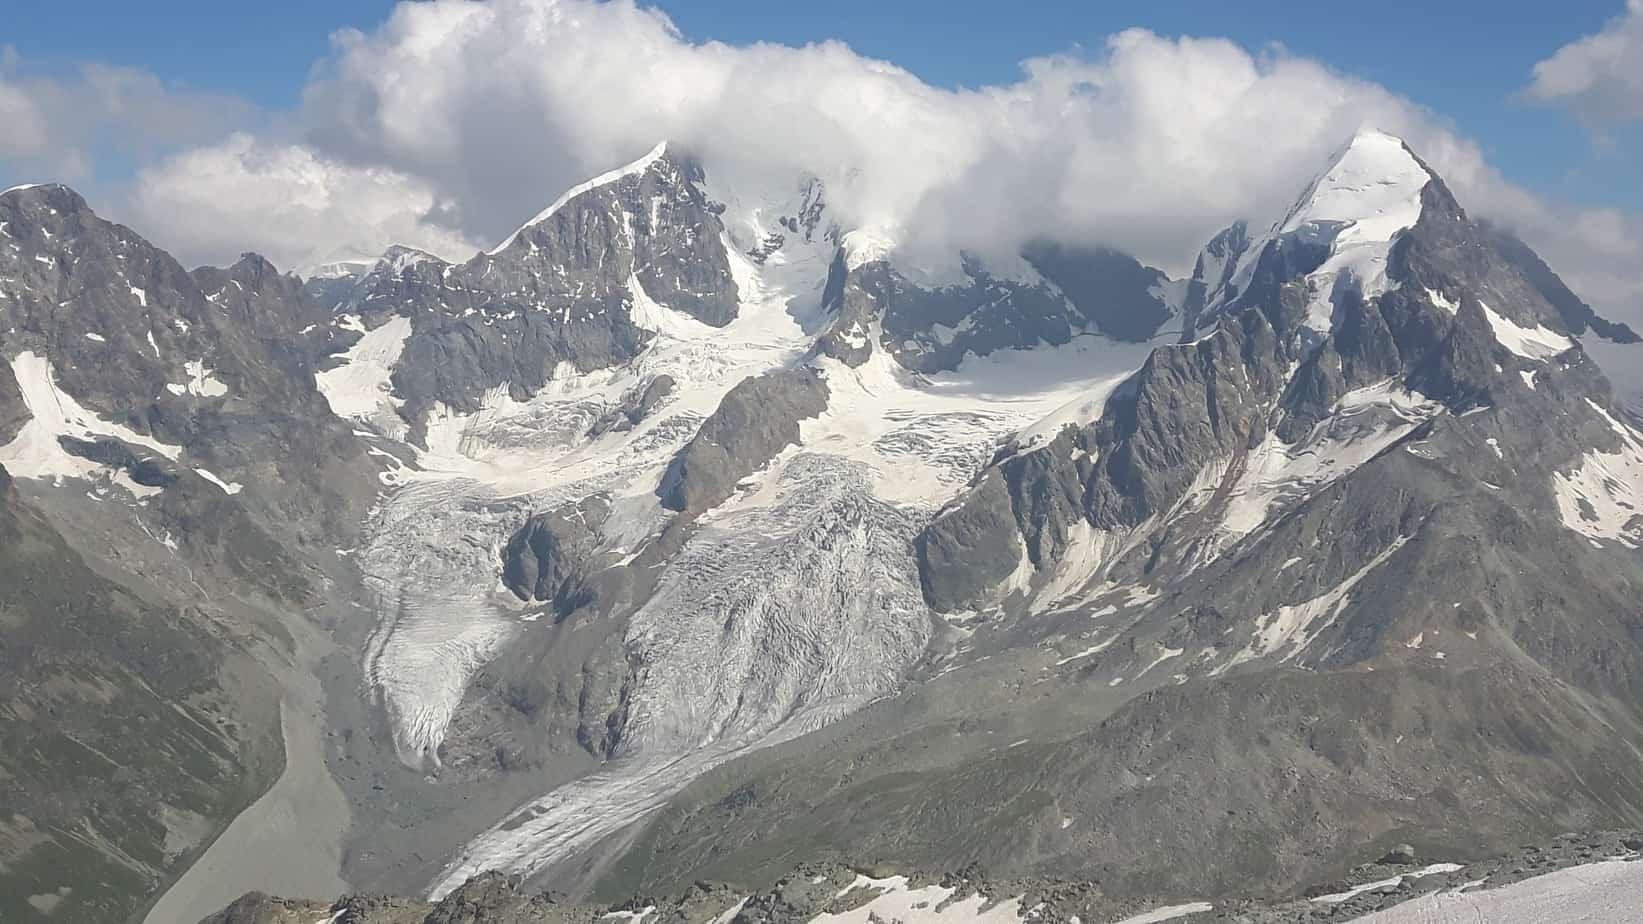 Gletscherrückgang am Bernina-Massiv